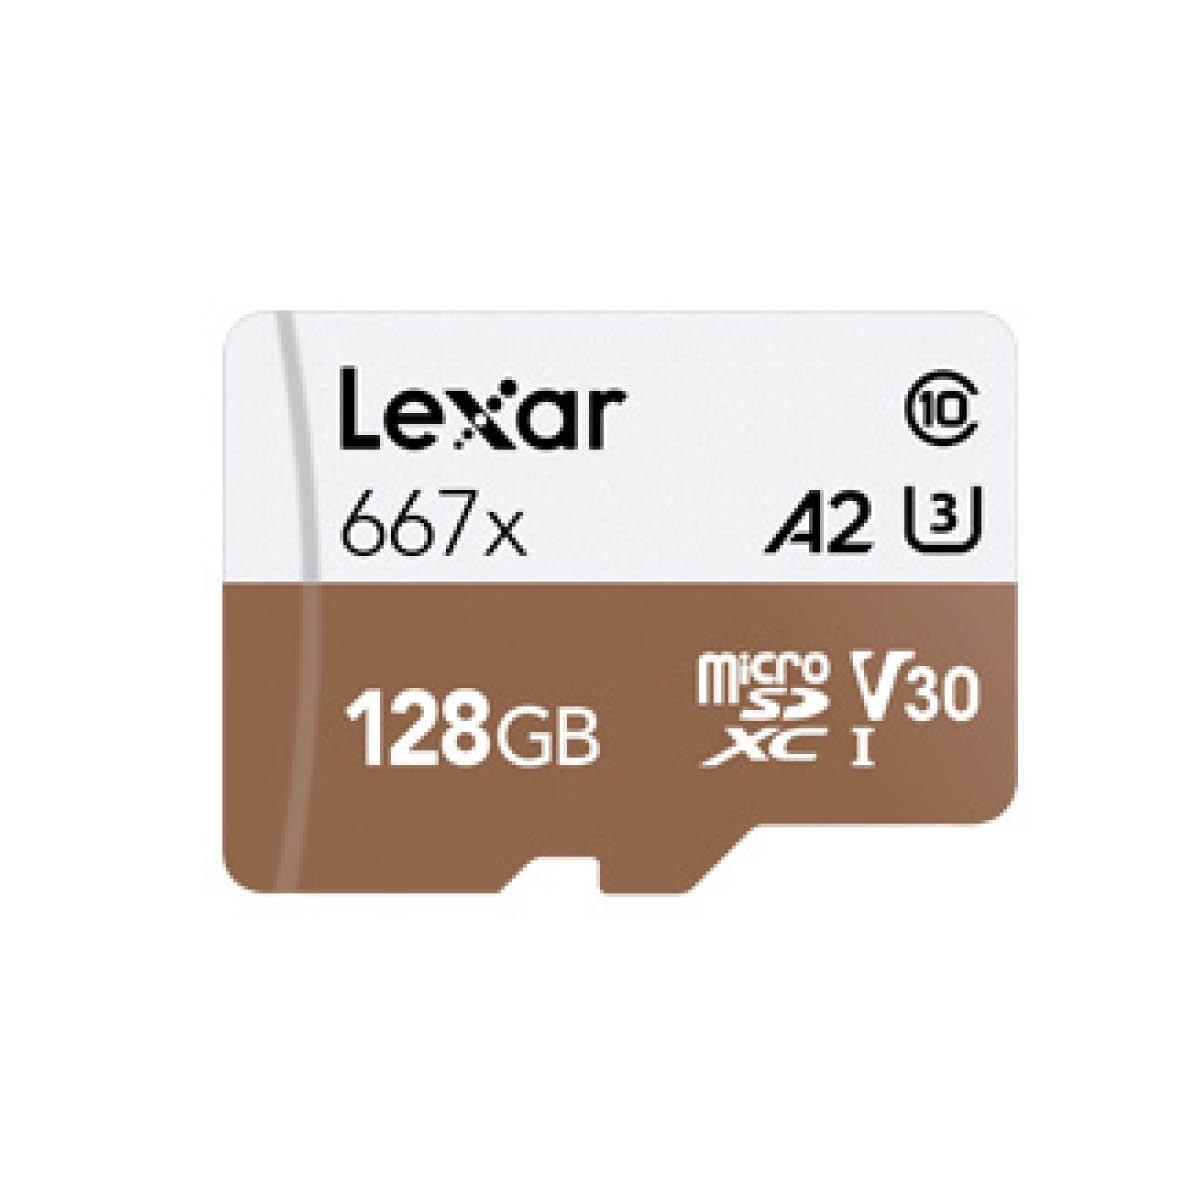 Lexar microSDXC 128 GB Professional UHS-I 667x